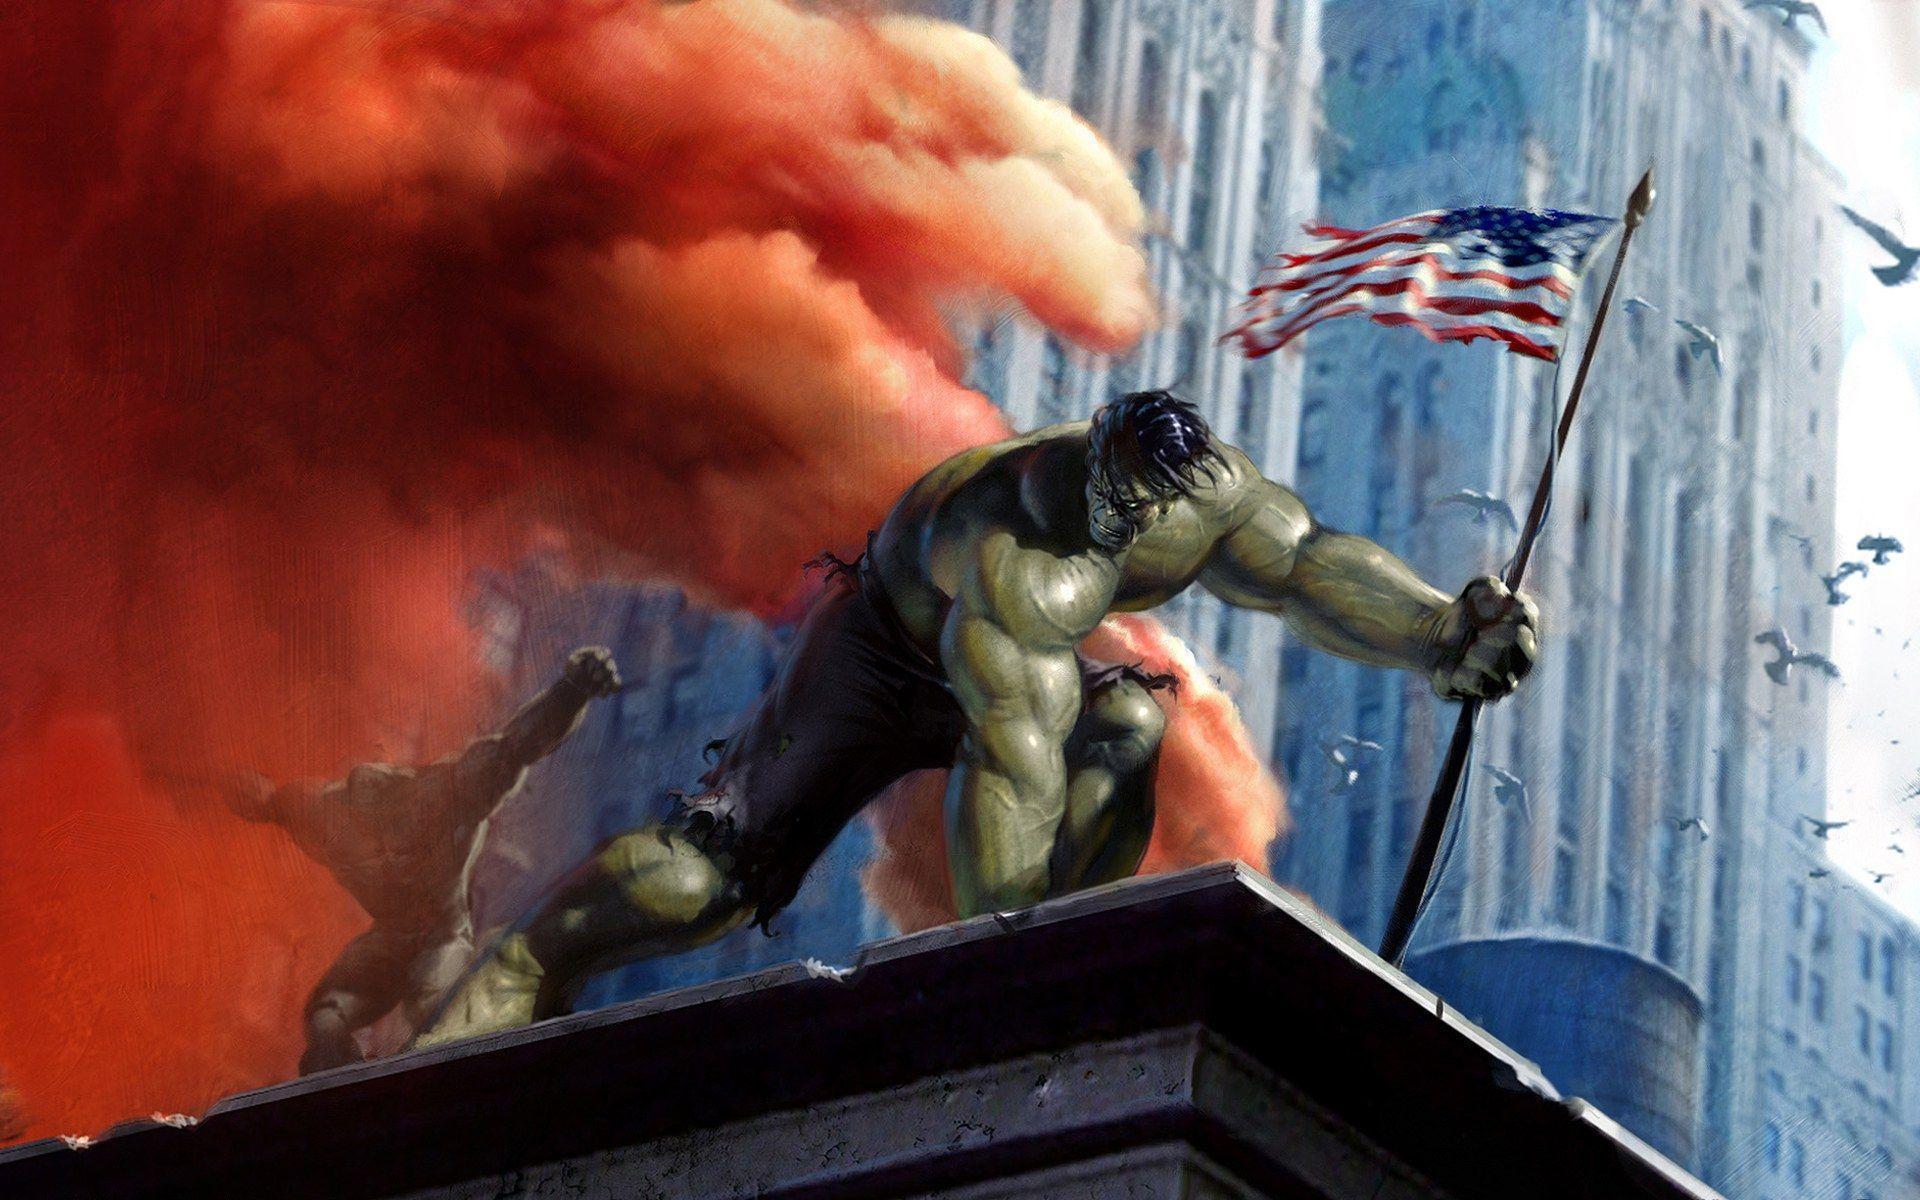 Most Downloaded Incredible Hulk Wallpapers - Full HD wallpaper search